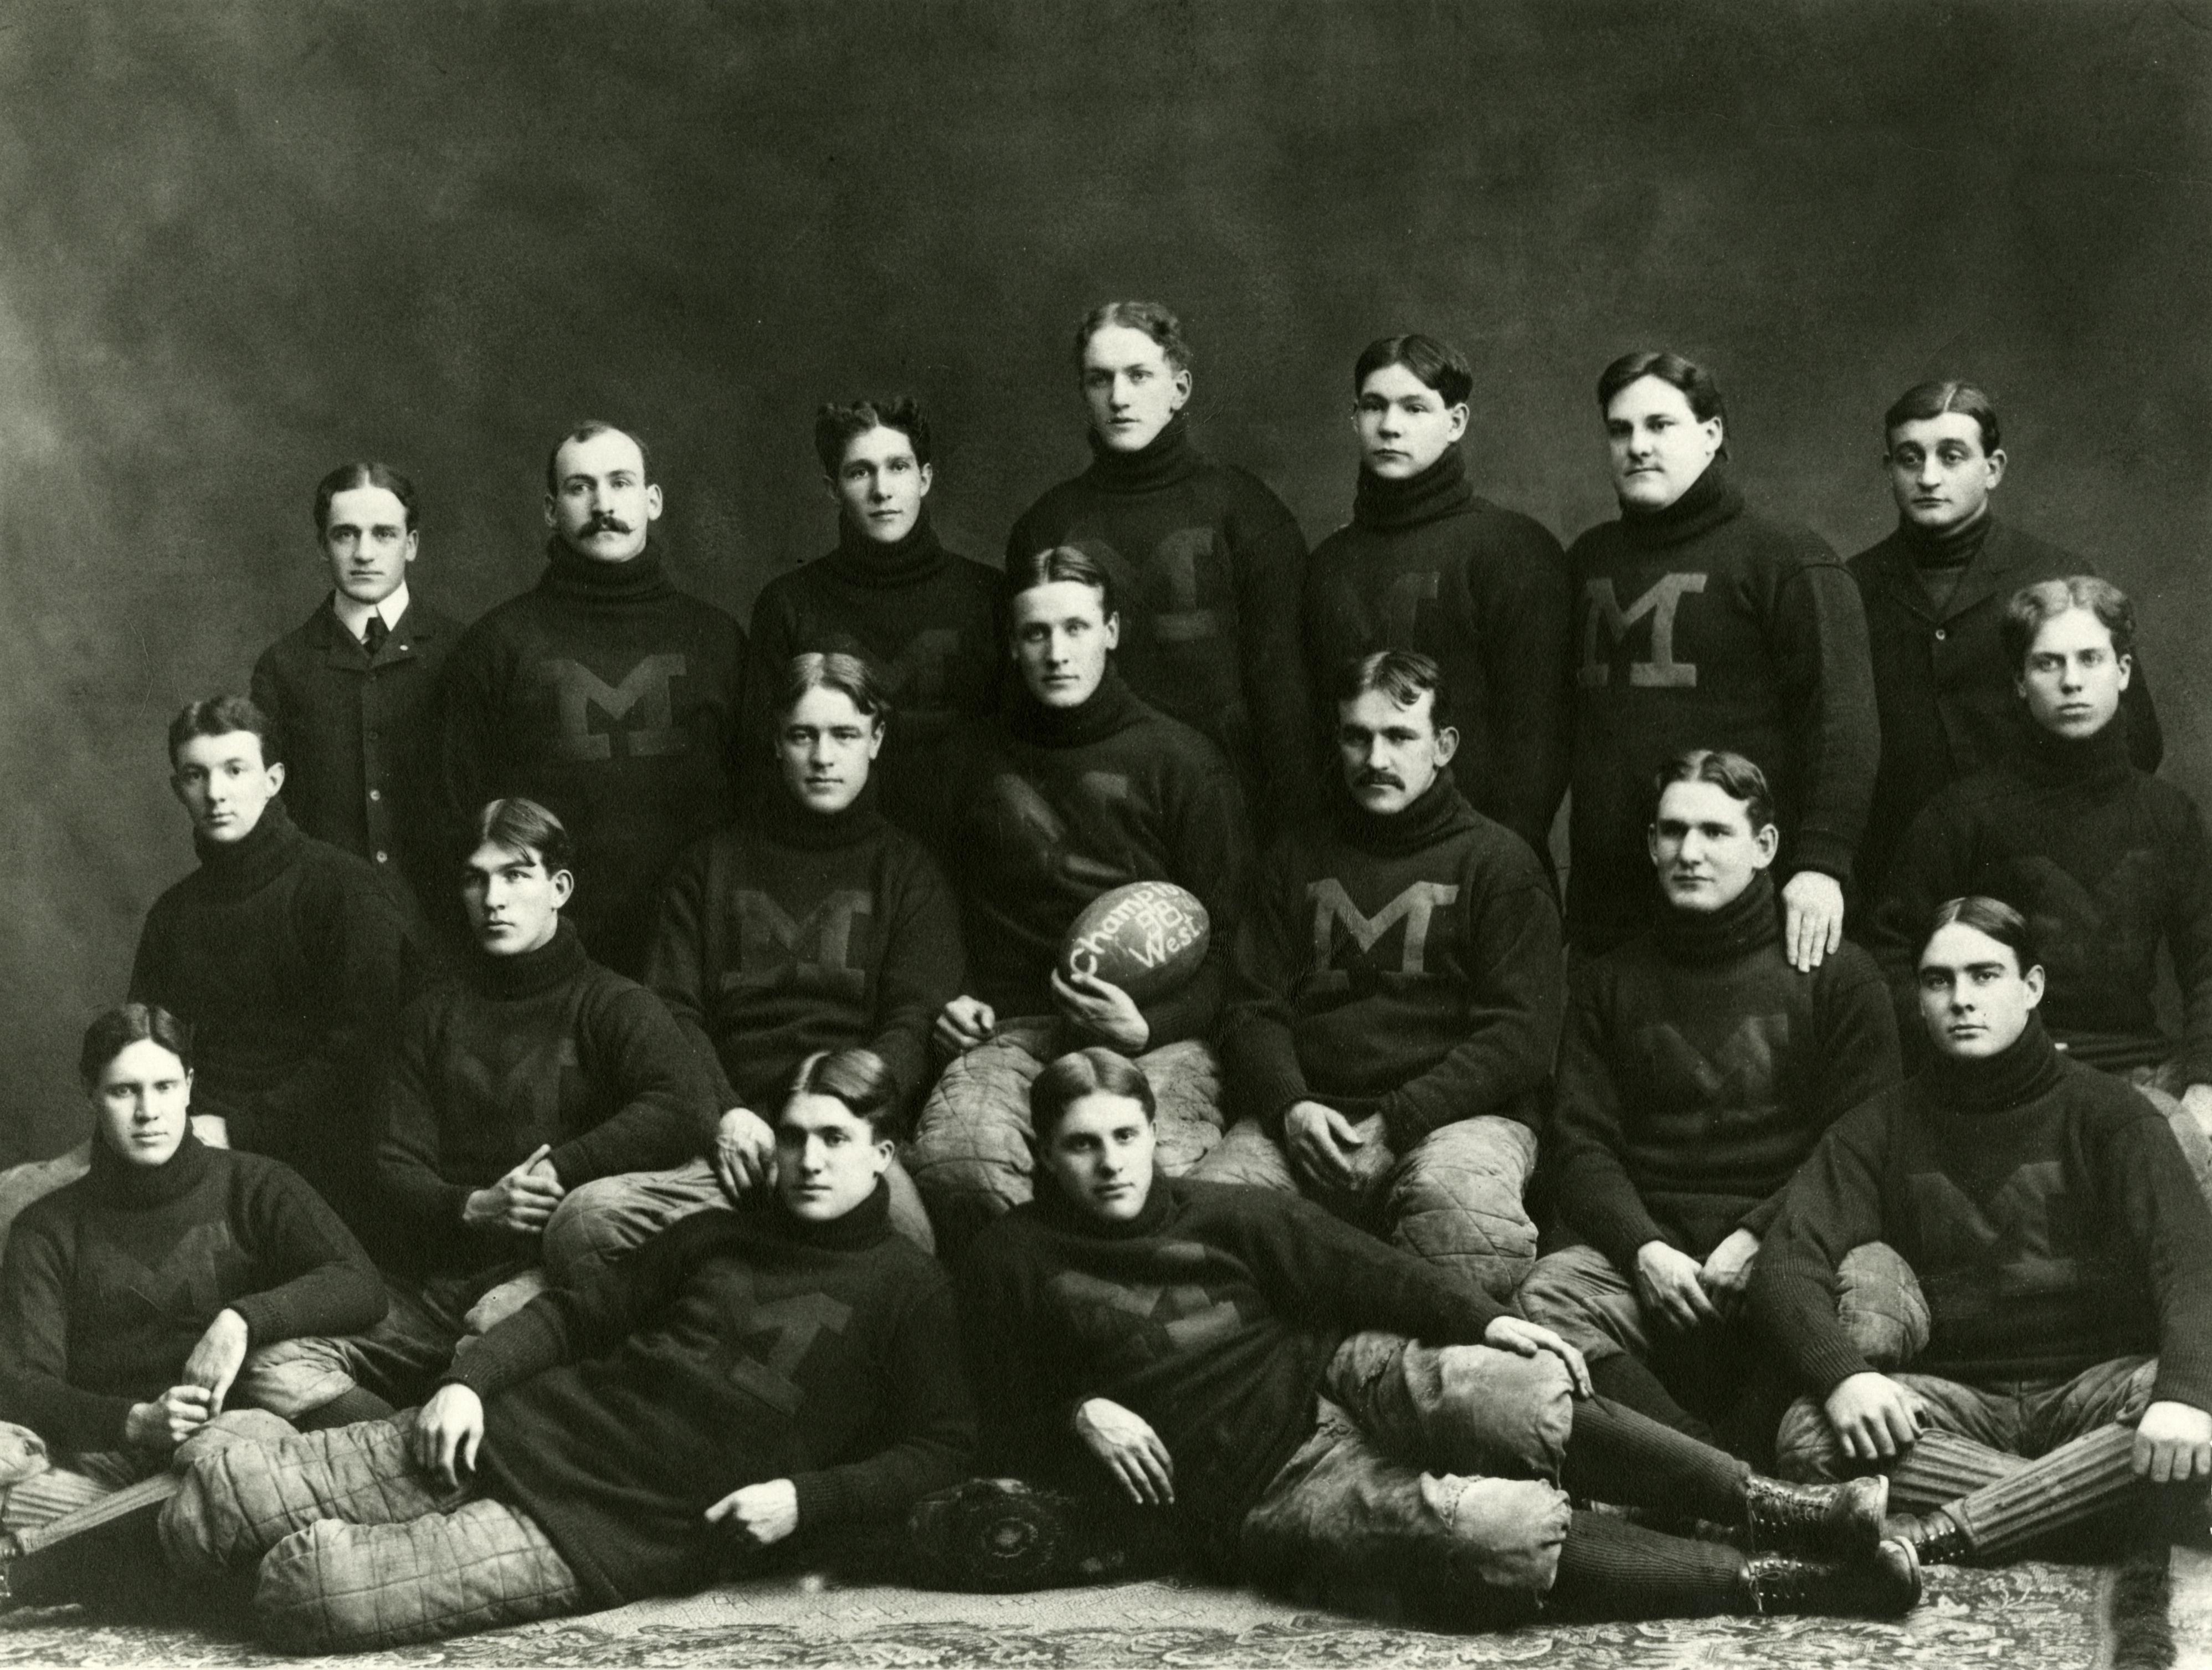 "1893 University of Michigan Football Team Old Photo 13/"" x 19/"" Reprint"